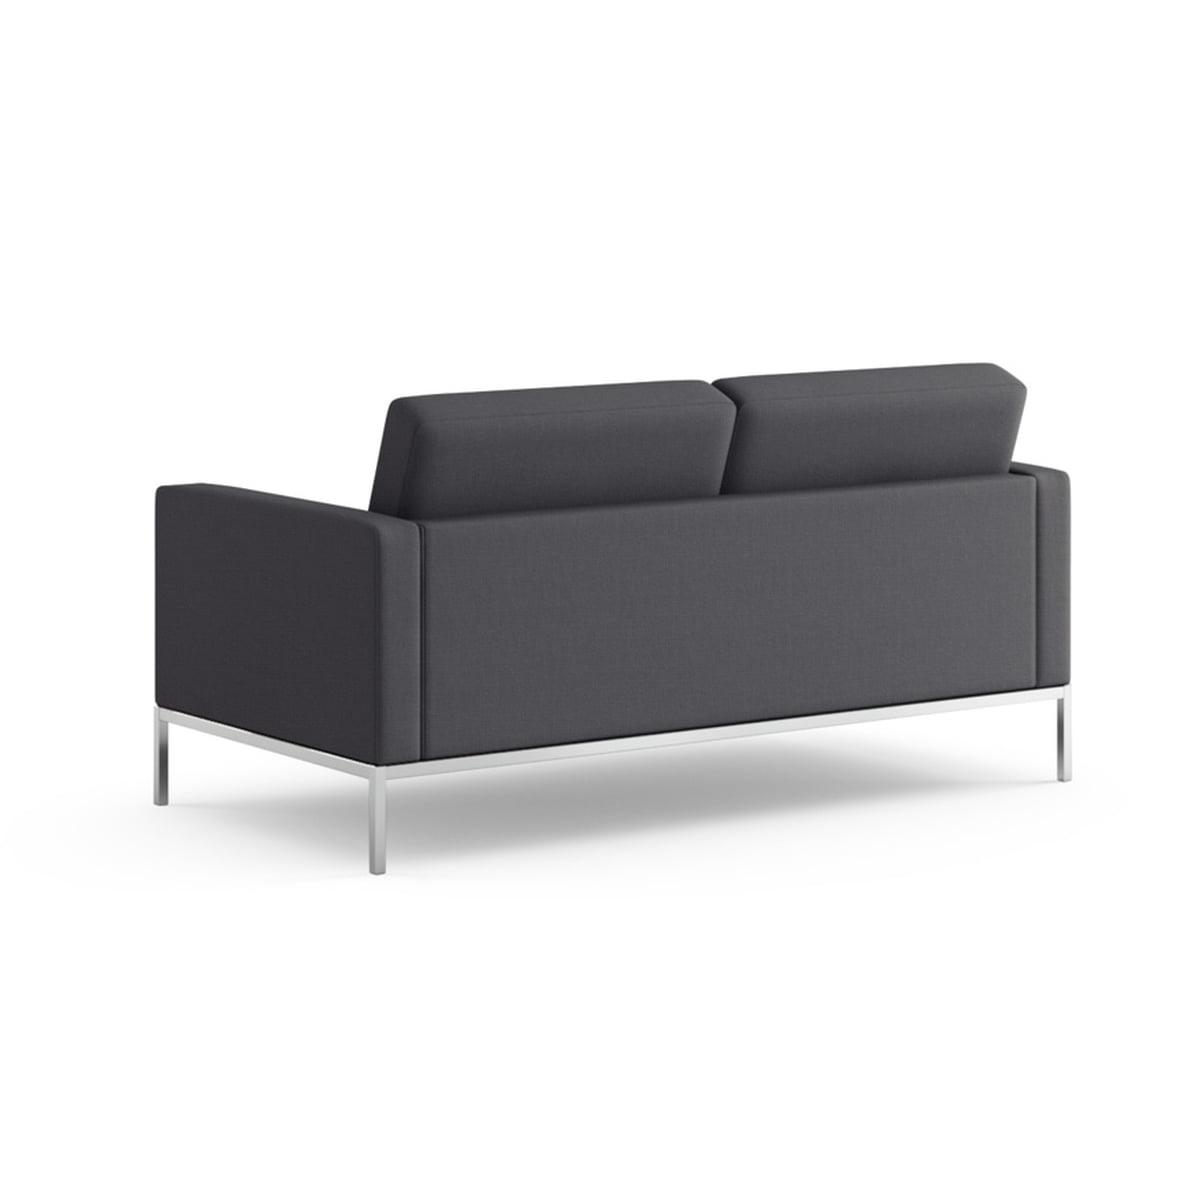 florence 2 sitzer sofa von knoll connox. Black Bedroom Furniture Sets. Home Design Ideas